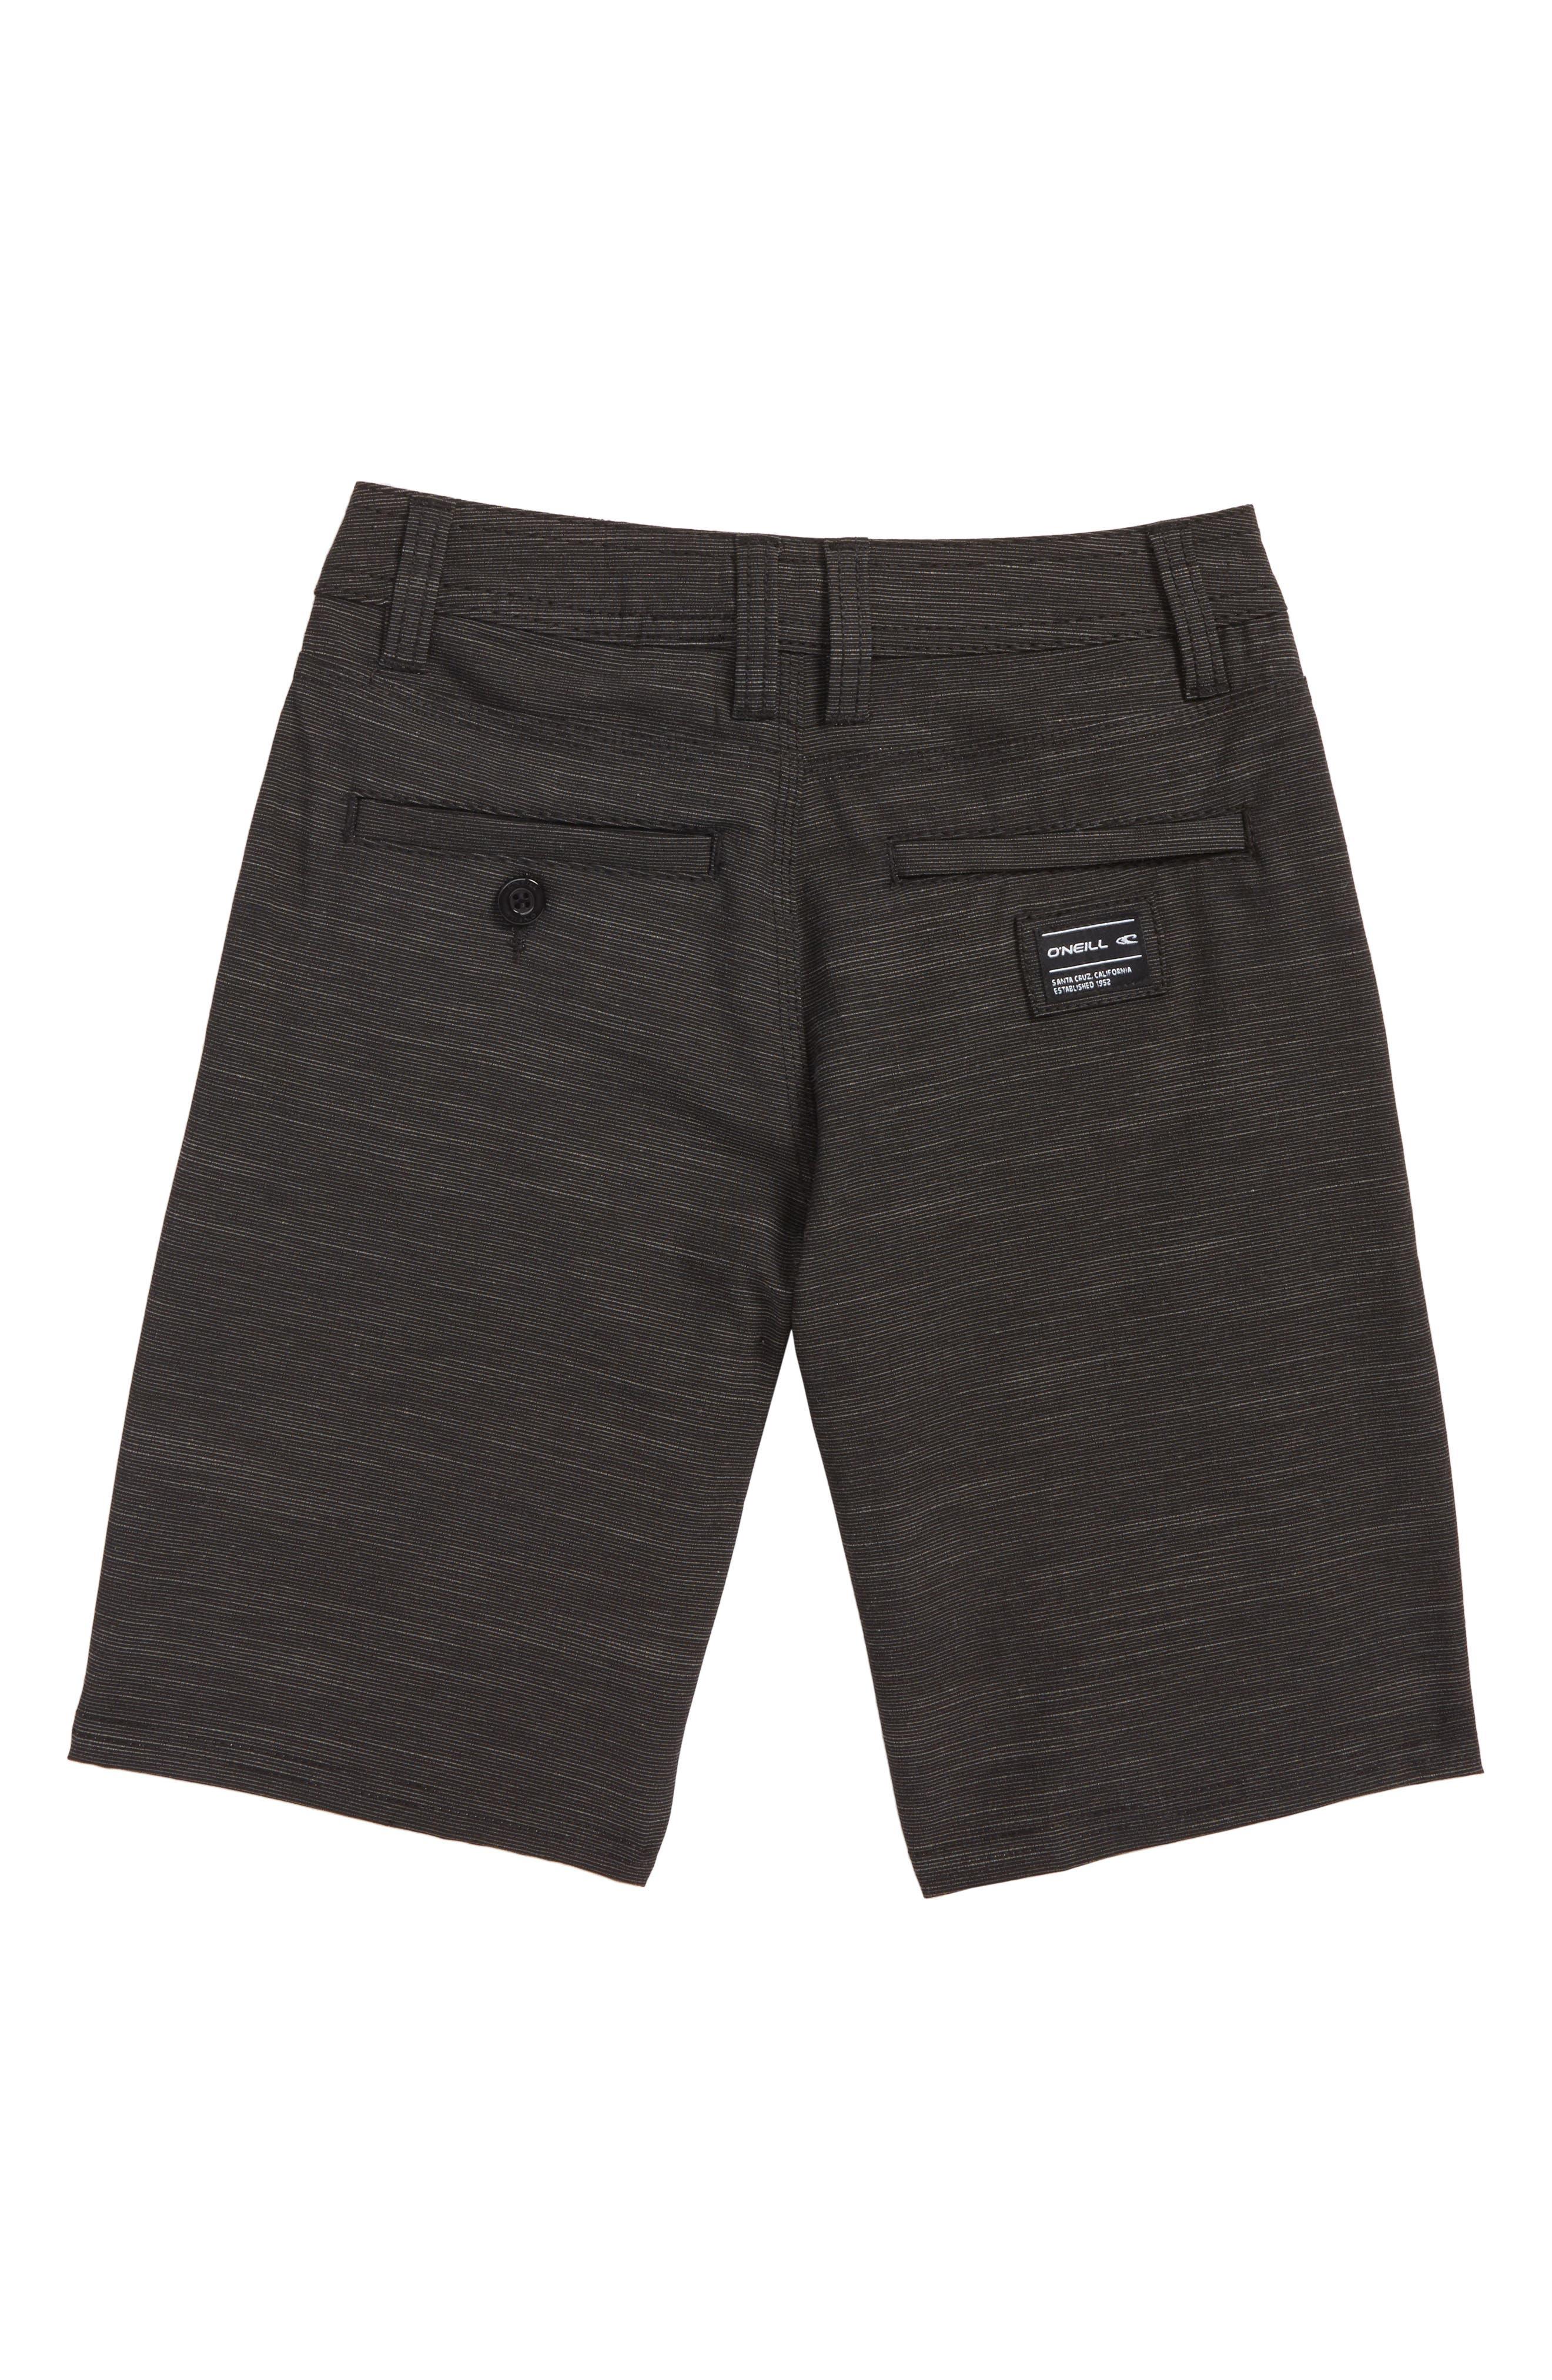 Locked Slub Hybrid Board Shorts,                             Alternate thumbnail 3, color,                             Black